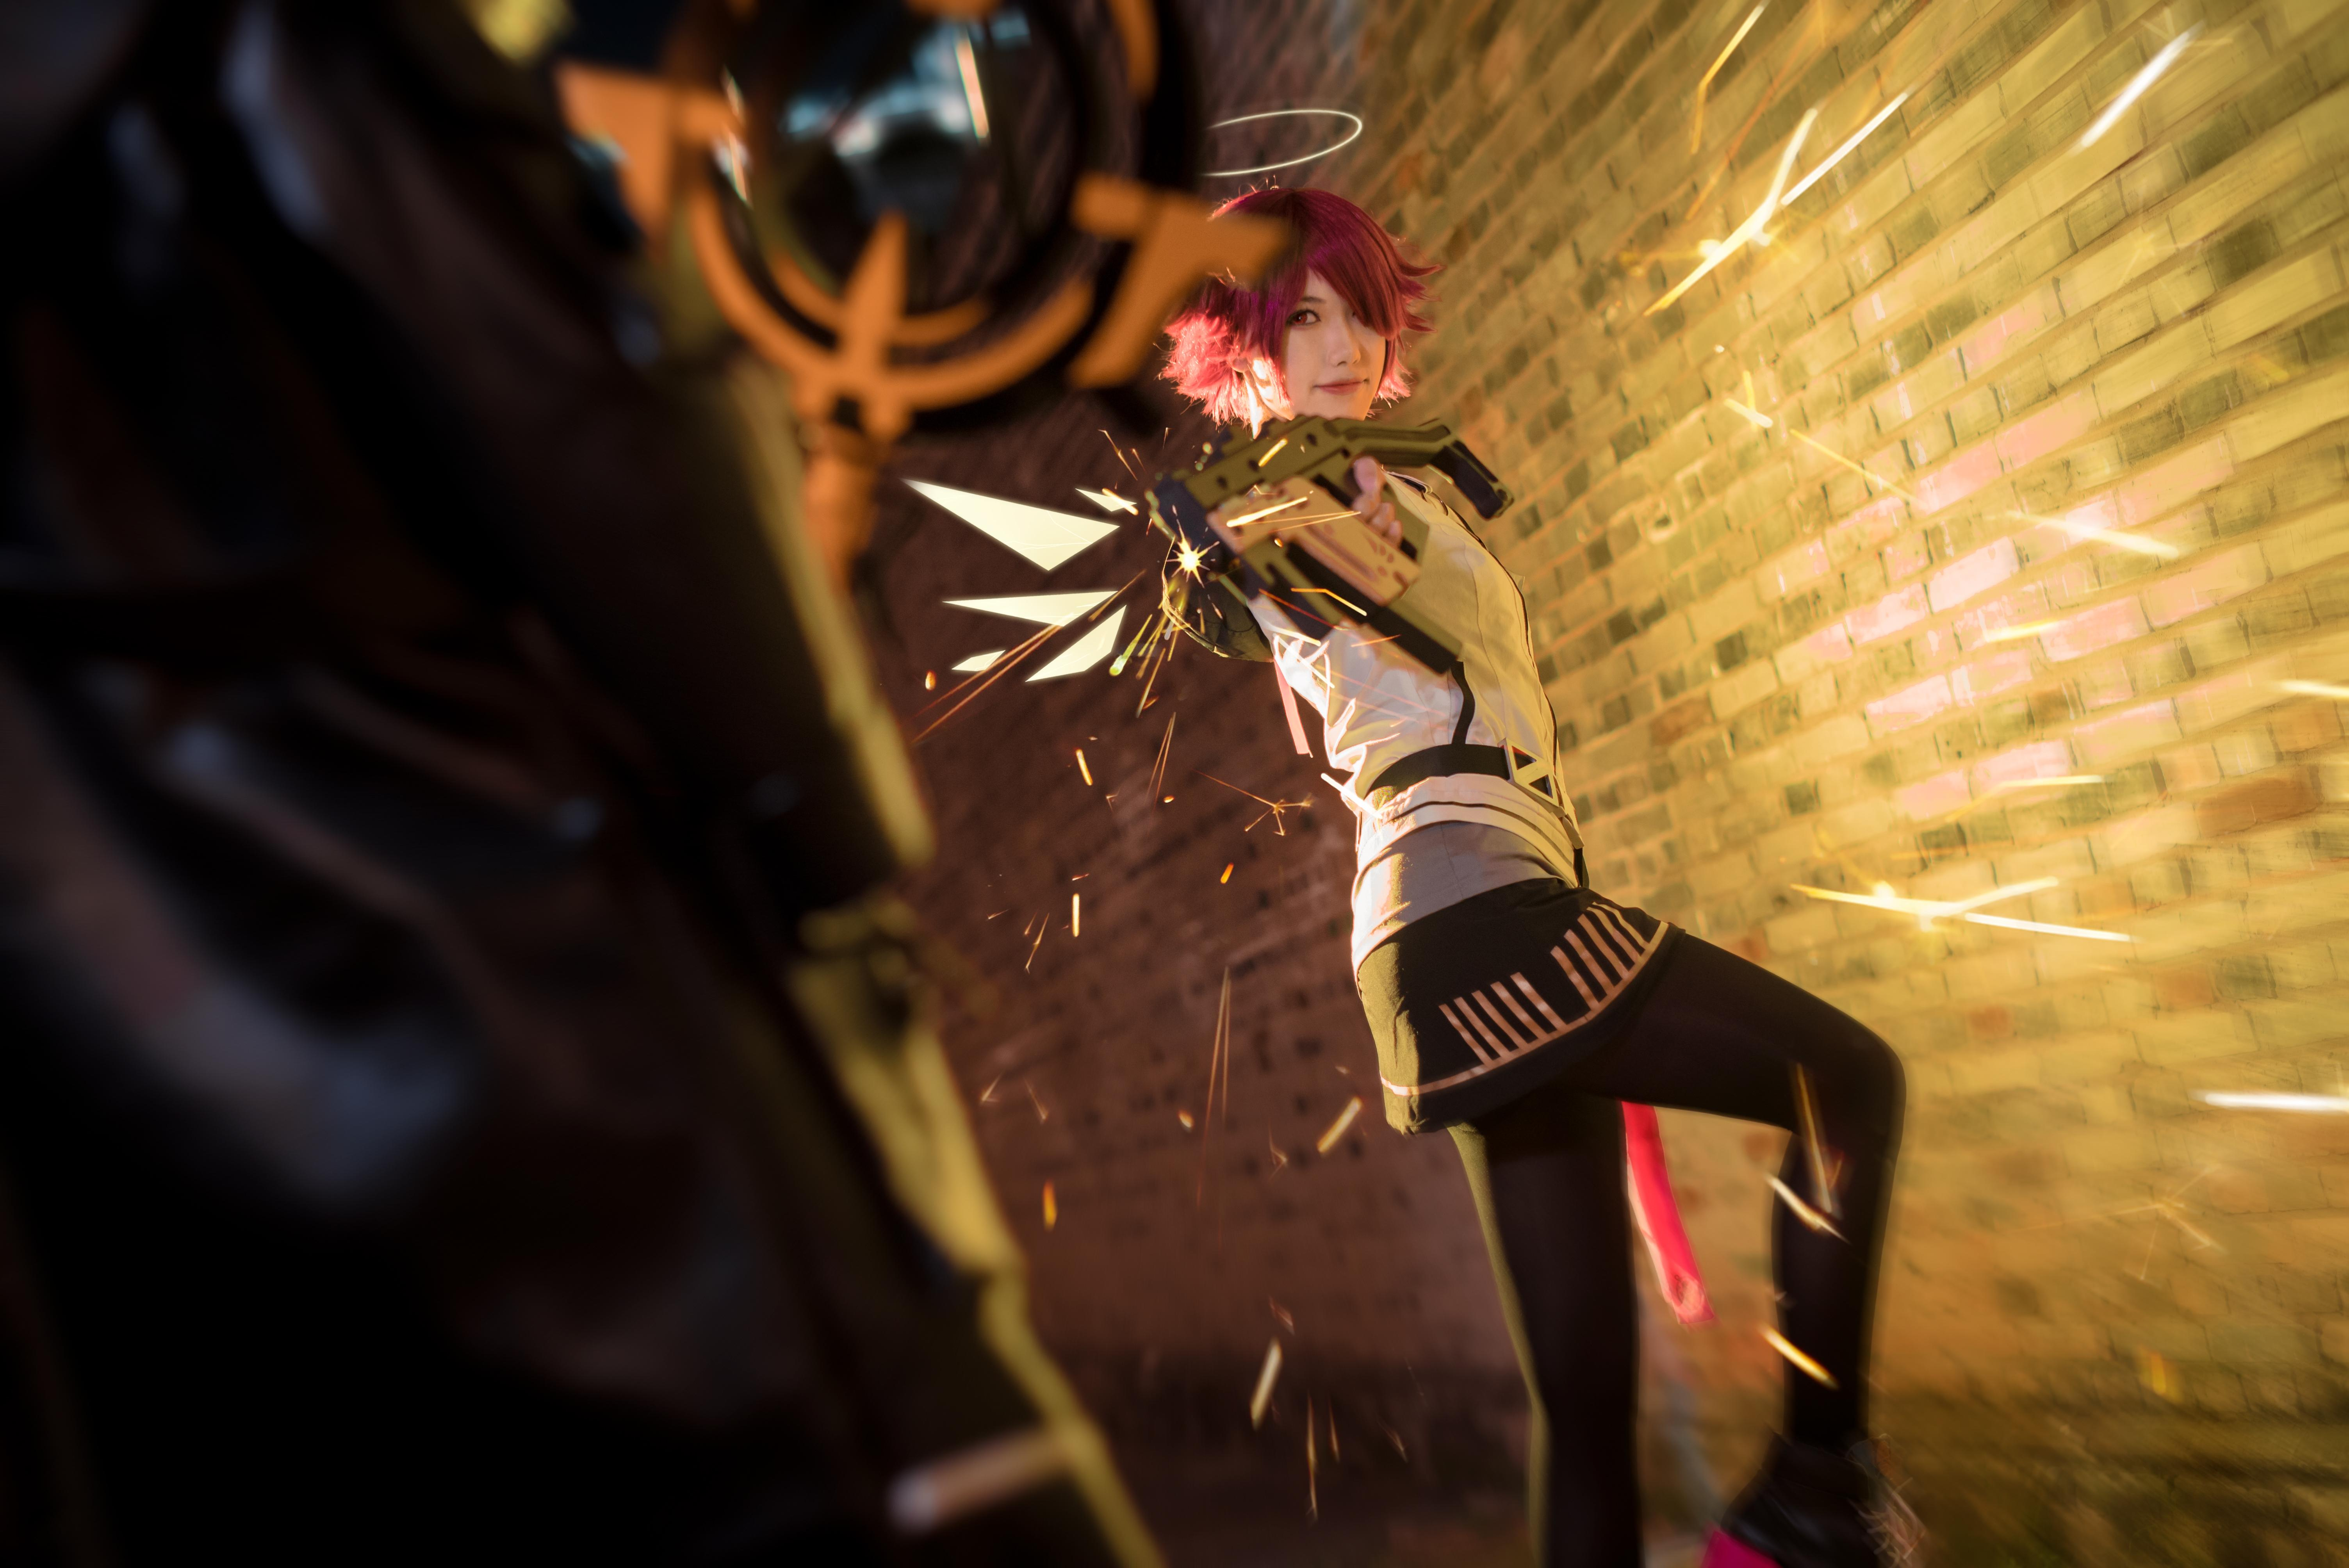 《明日方舟》法则cosplay【CN:KizunaFerin】-第37张